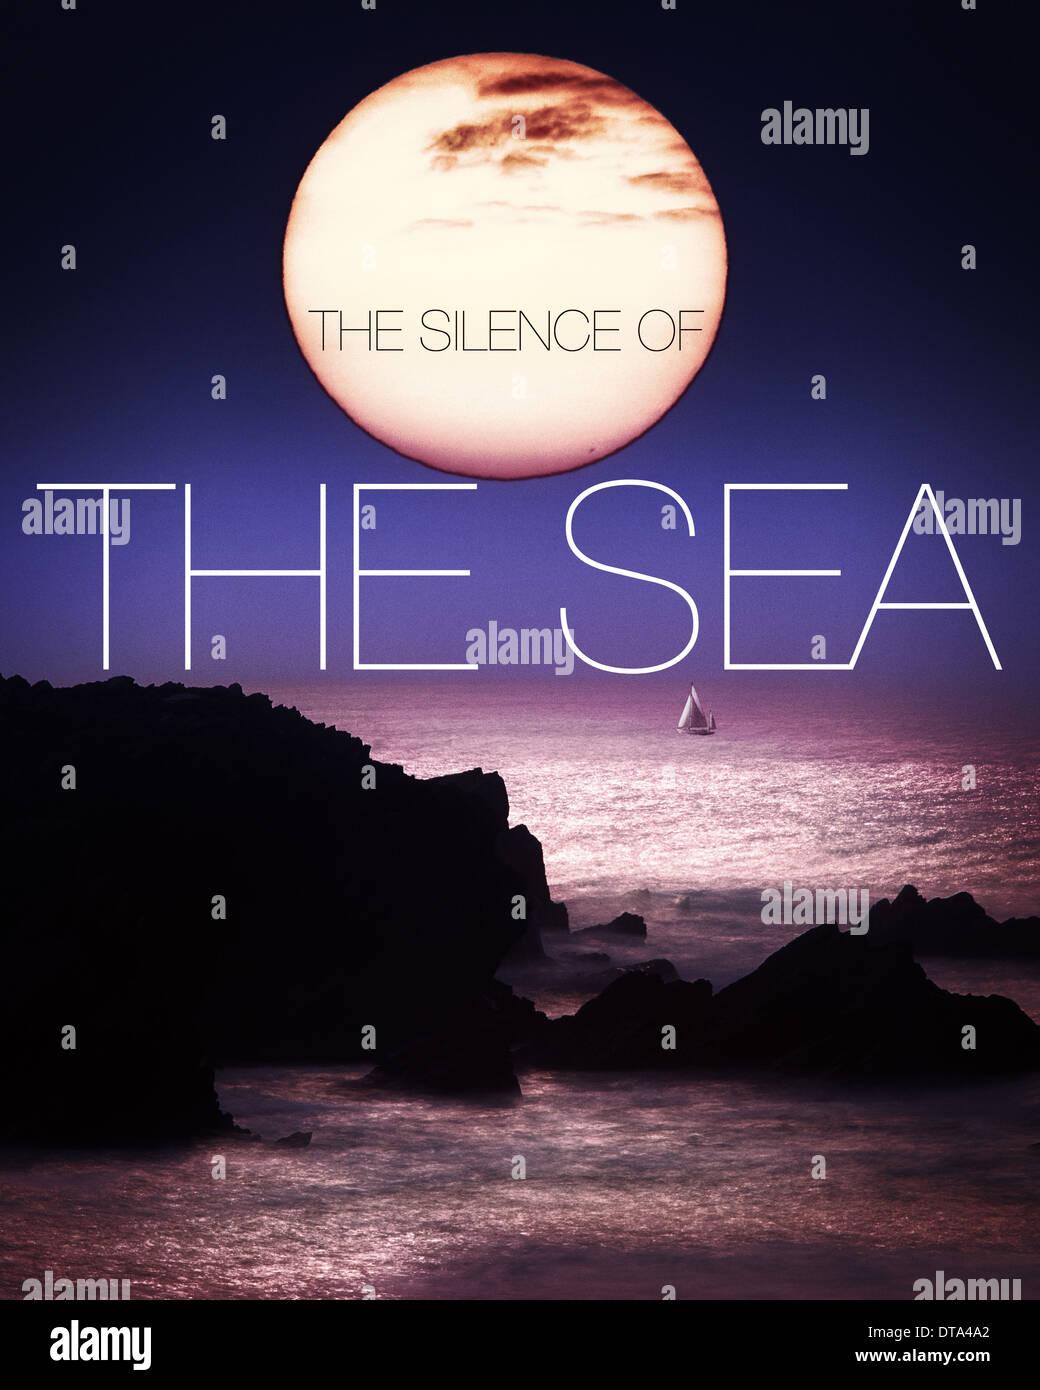 Konzept-Fotografie: Das Schweigen des Meeres Stockbild